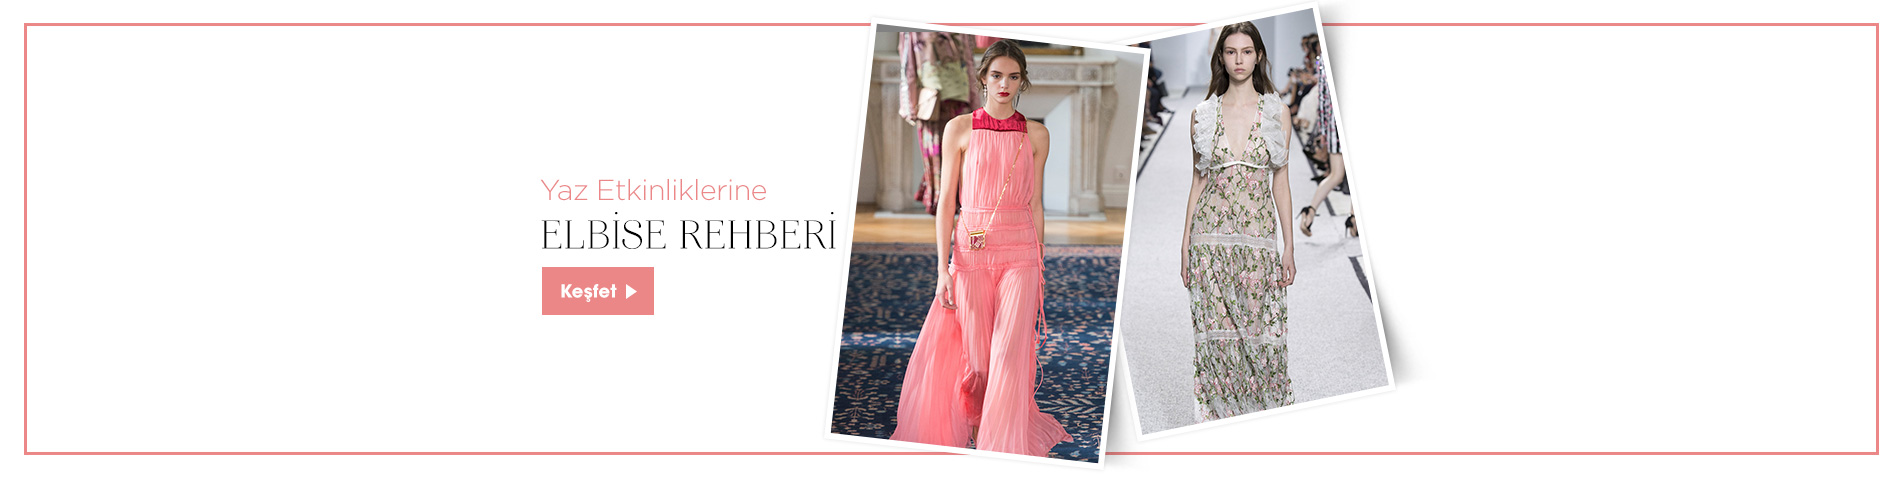 yaz_etkinliklerine_elbise_rehberi_SLiDER